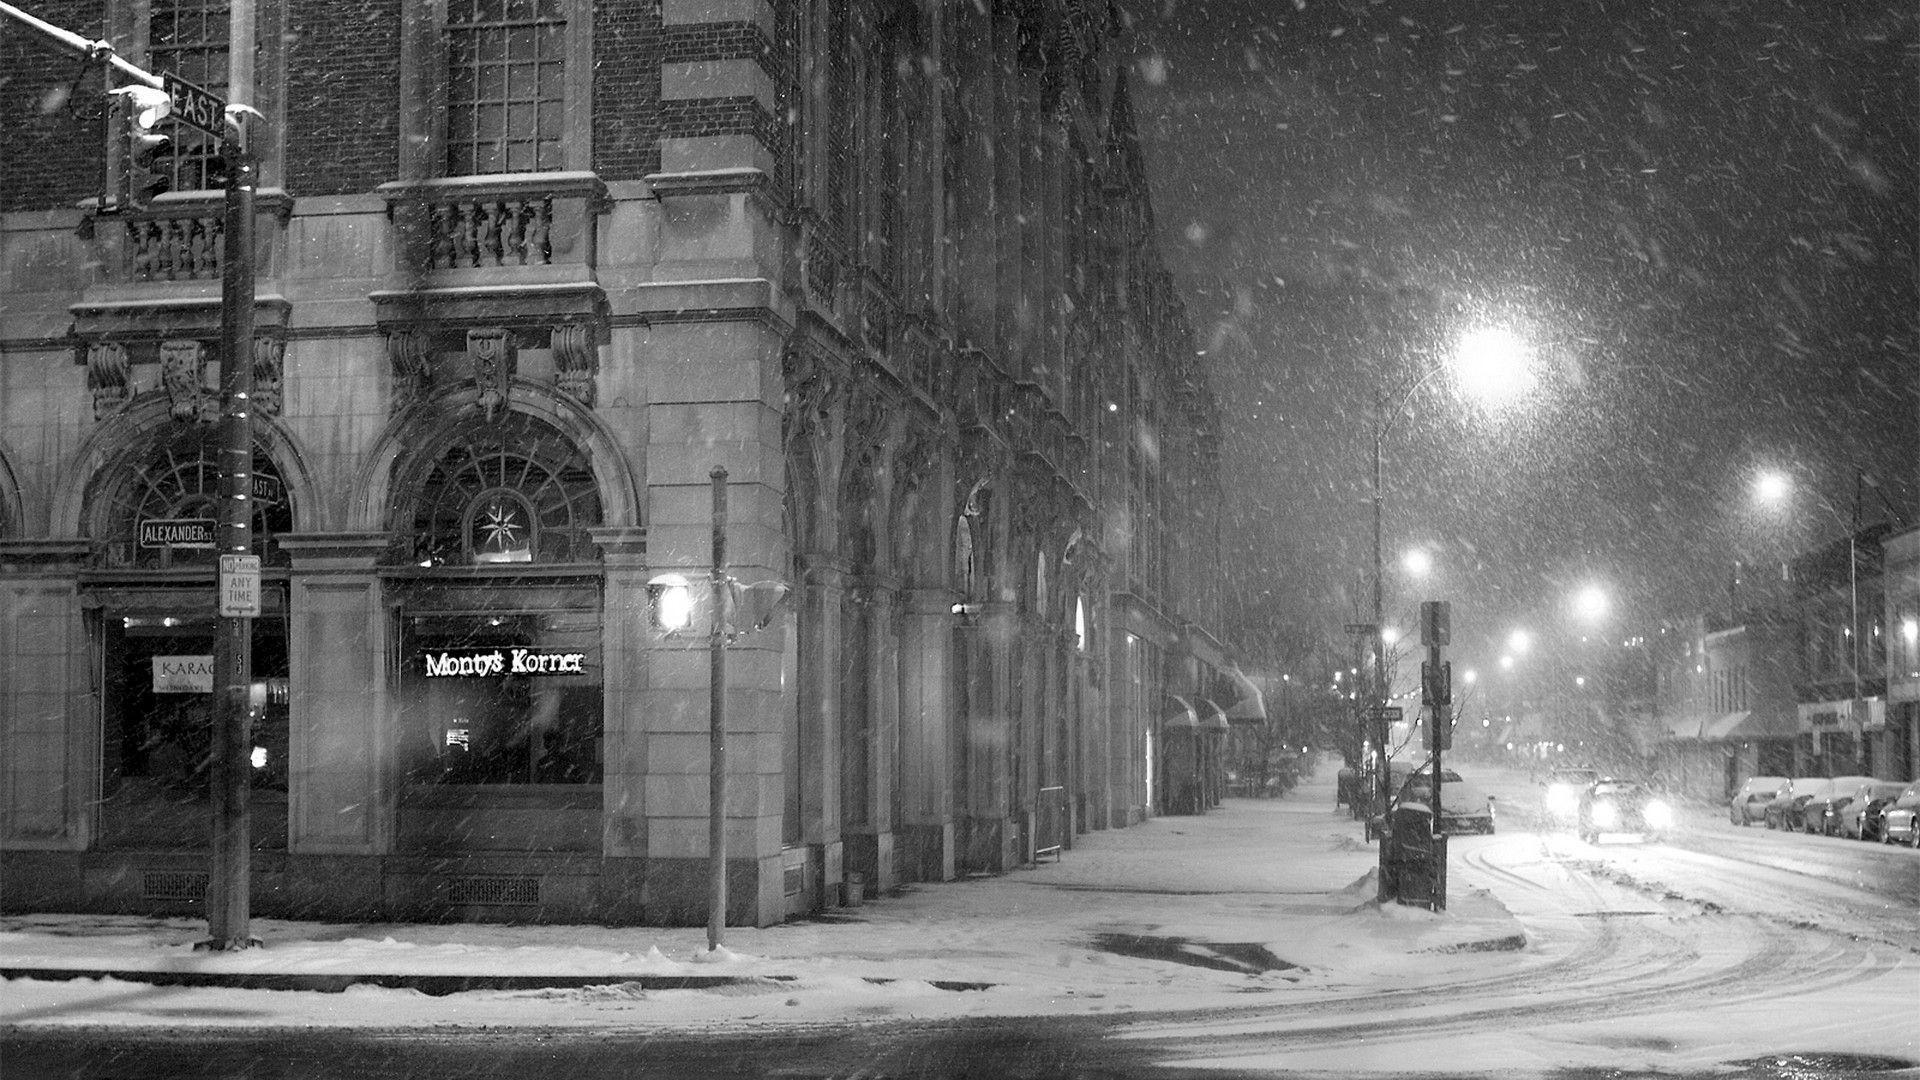 Download Wallpaper City, Street, Snow, Winter, Lane .